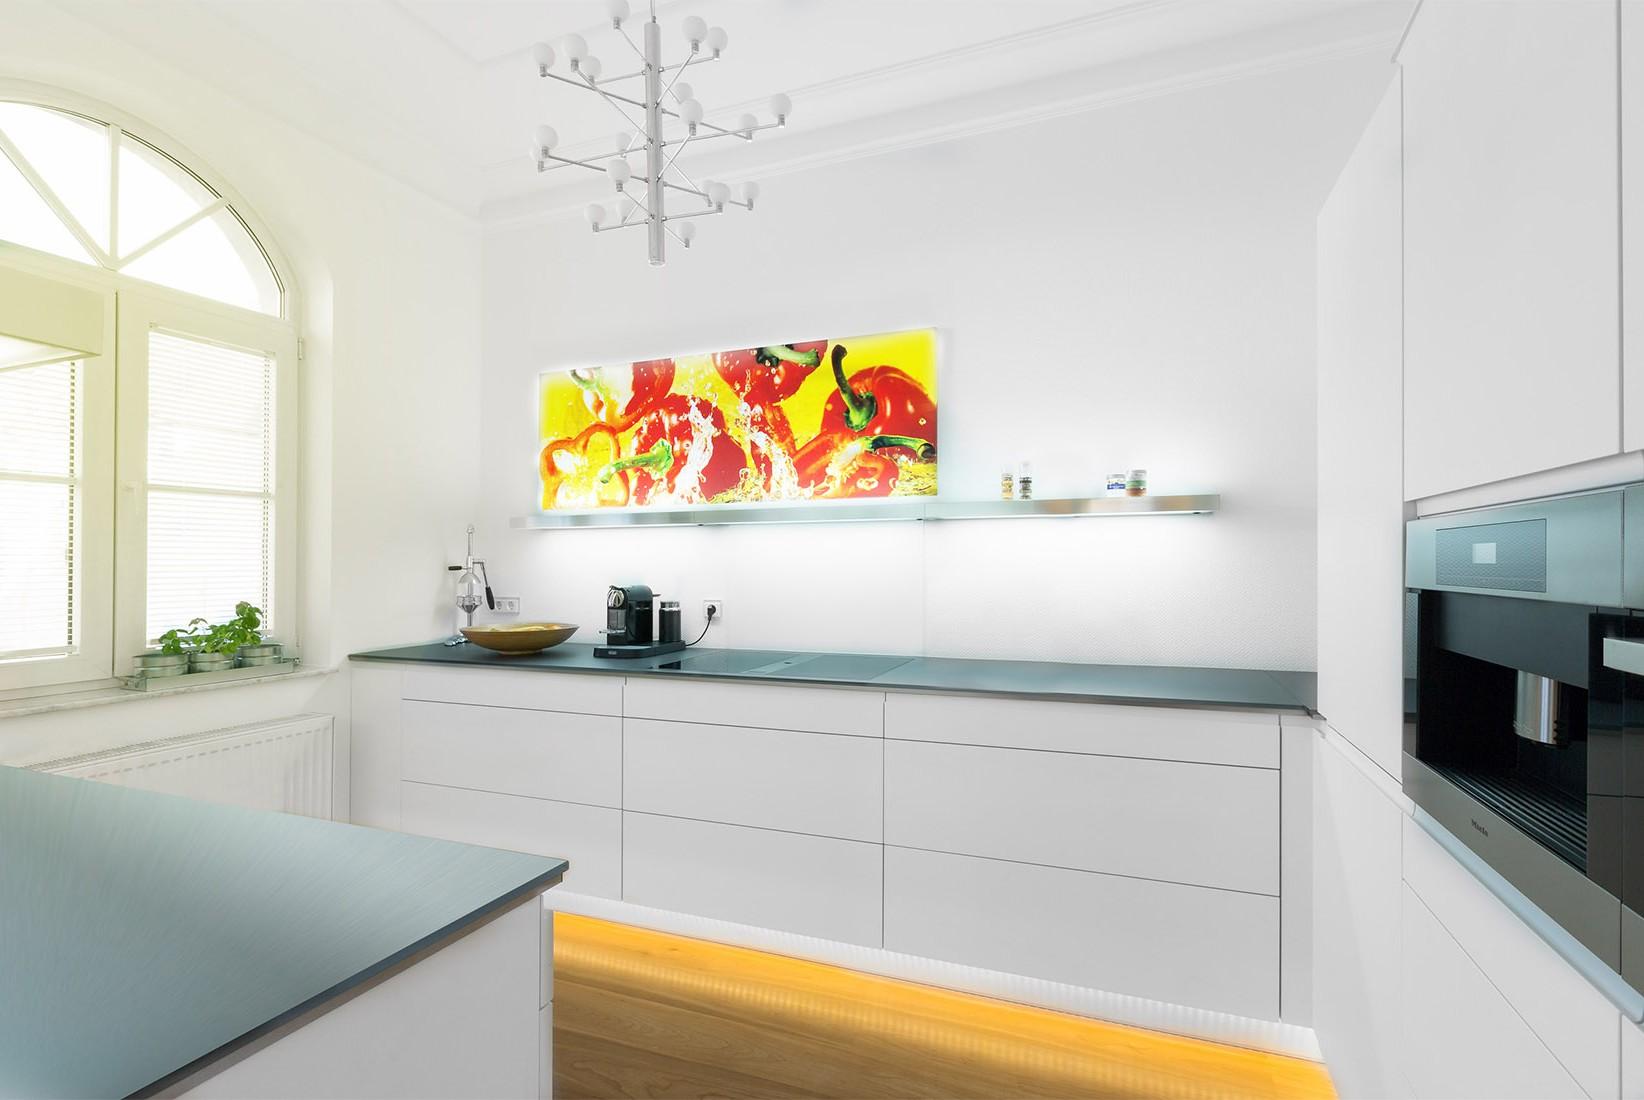 00021-Fotograf-Architektur-Achitecture-interior-Werbefotograf-Stuttgart-Andreas-Martin